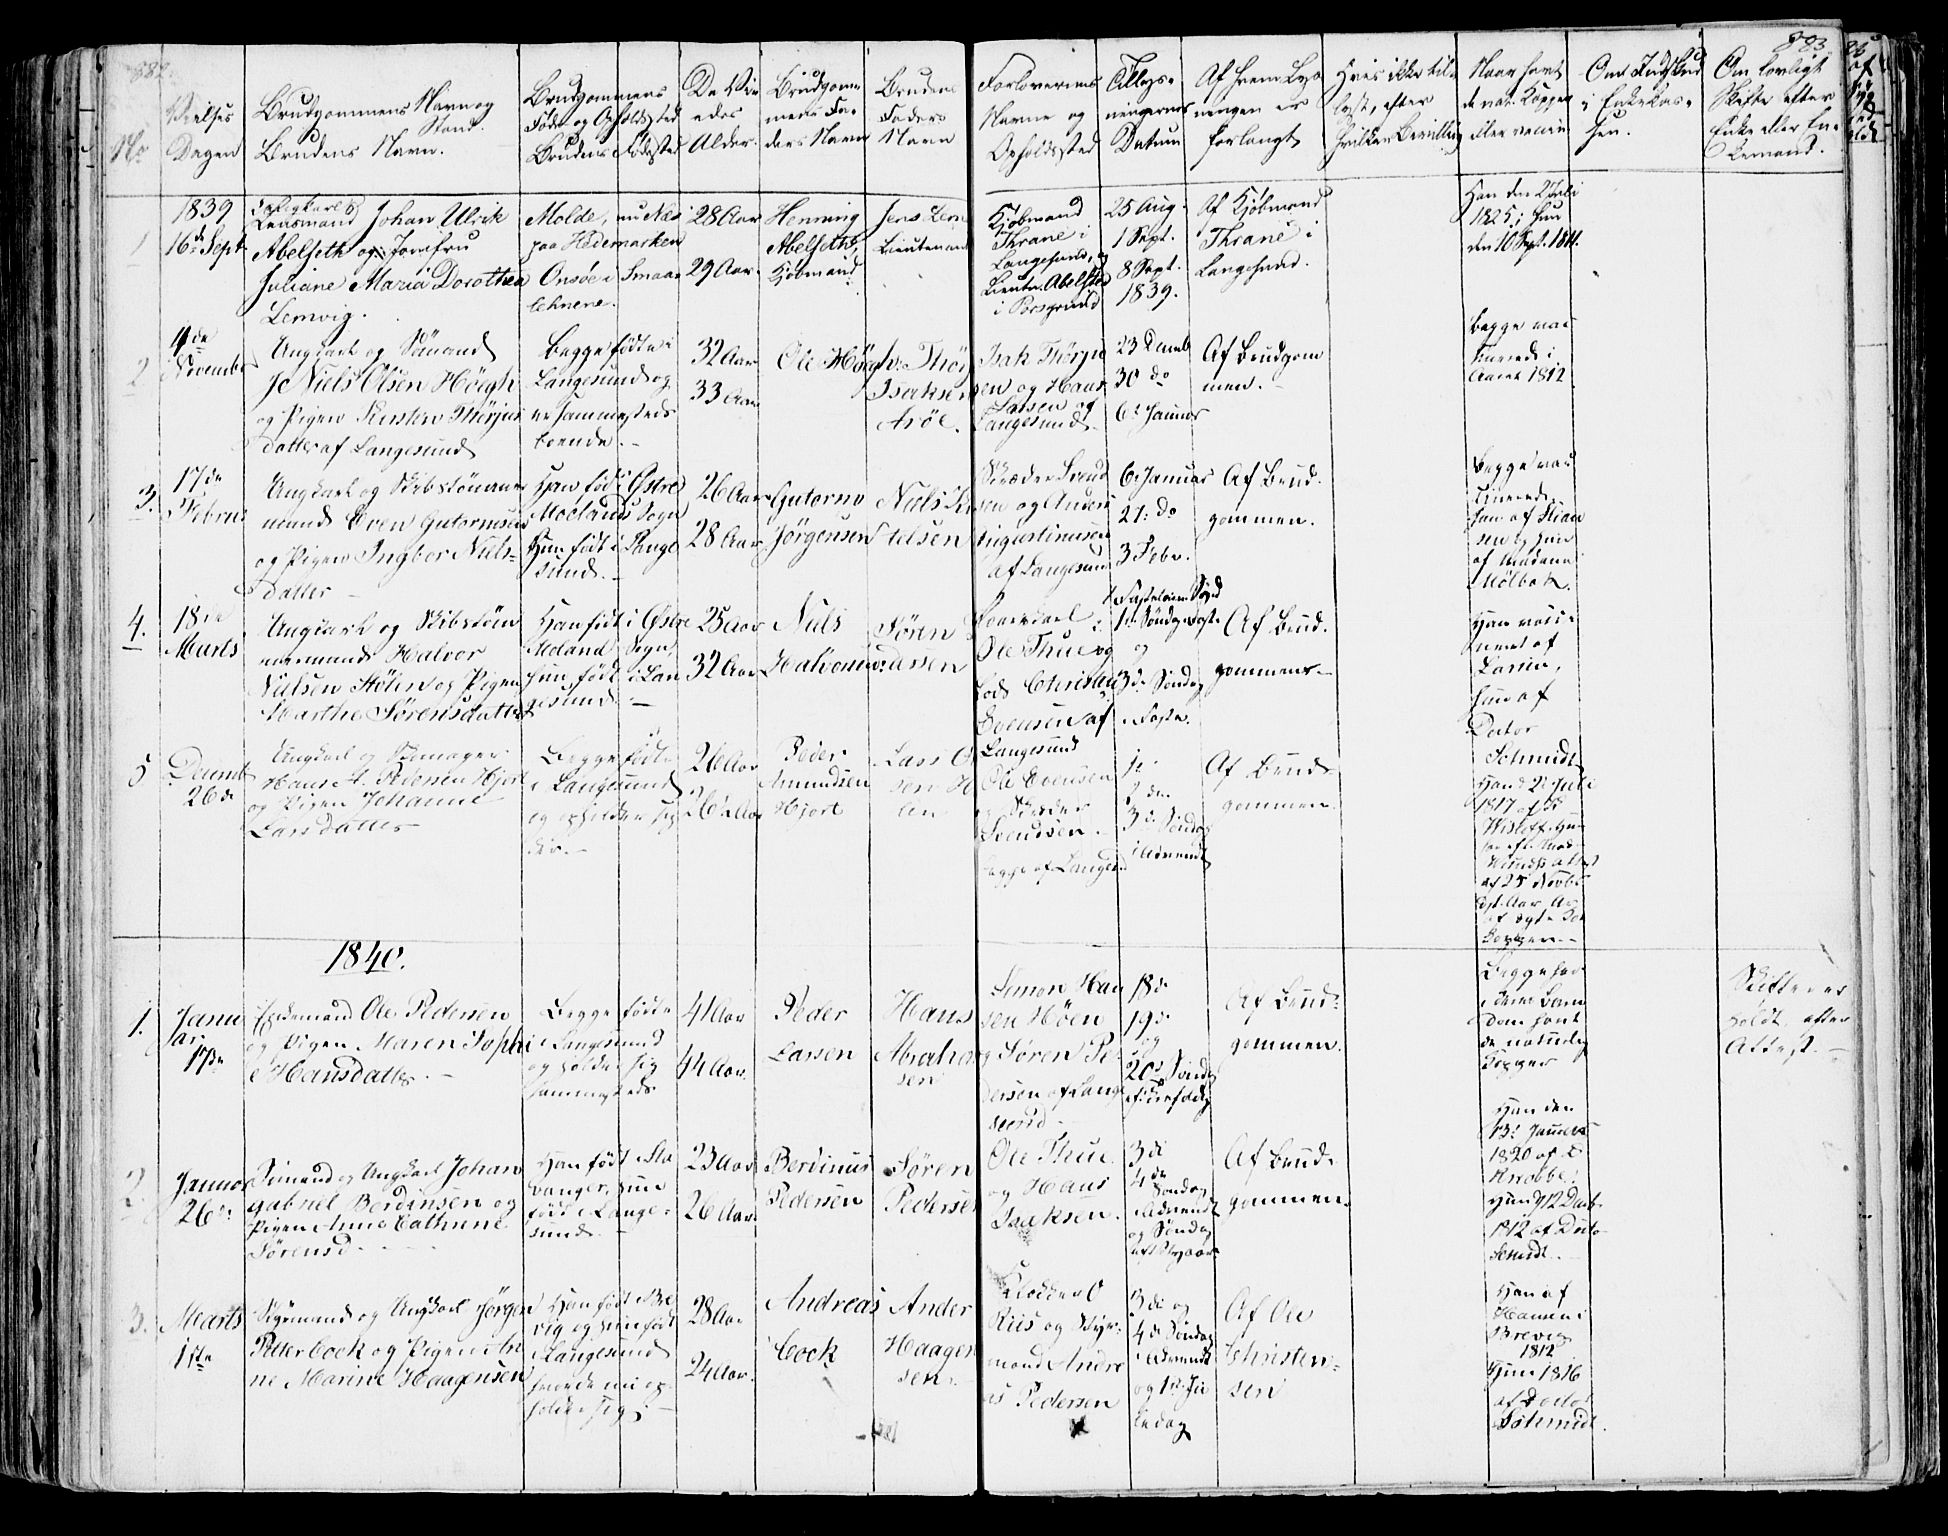 SAKO, Bamble kirkebøker, F/Fa/L0004: Ministerialbok nr. I 4, 1834-1853, s. 882-883